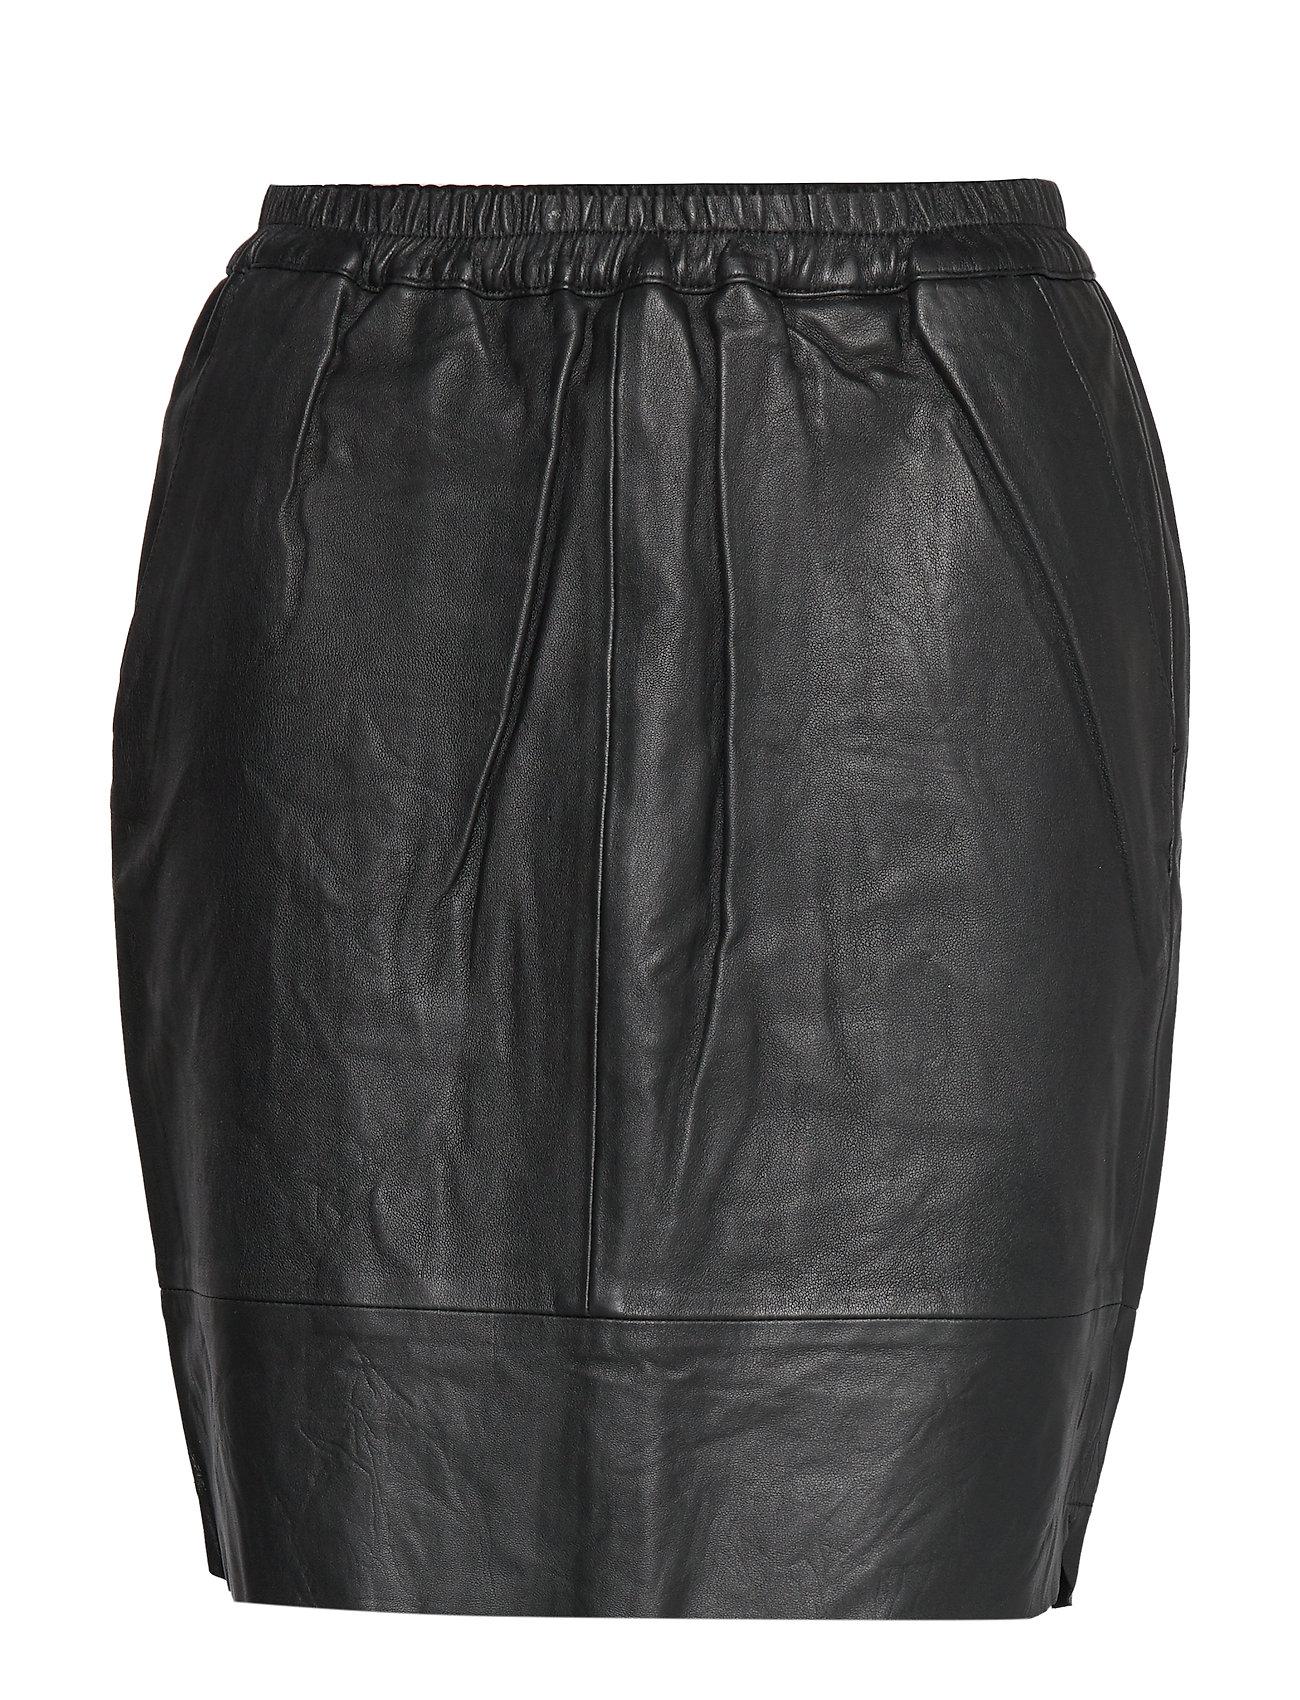 Coster Copenhagen Leather skirt w. elastic in waist - BLACK